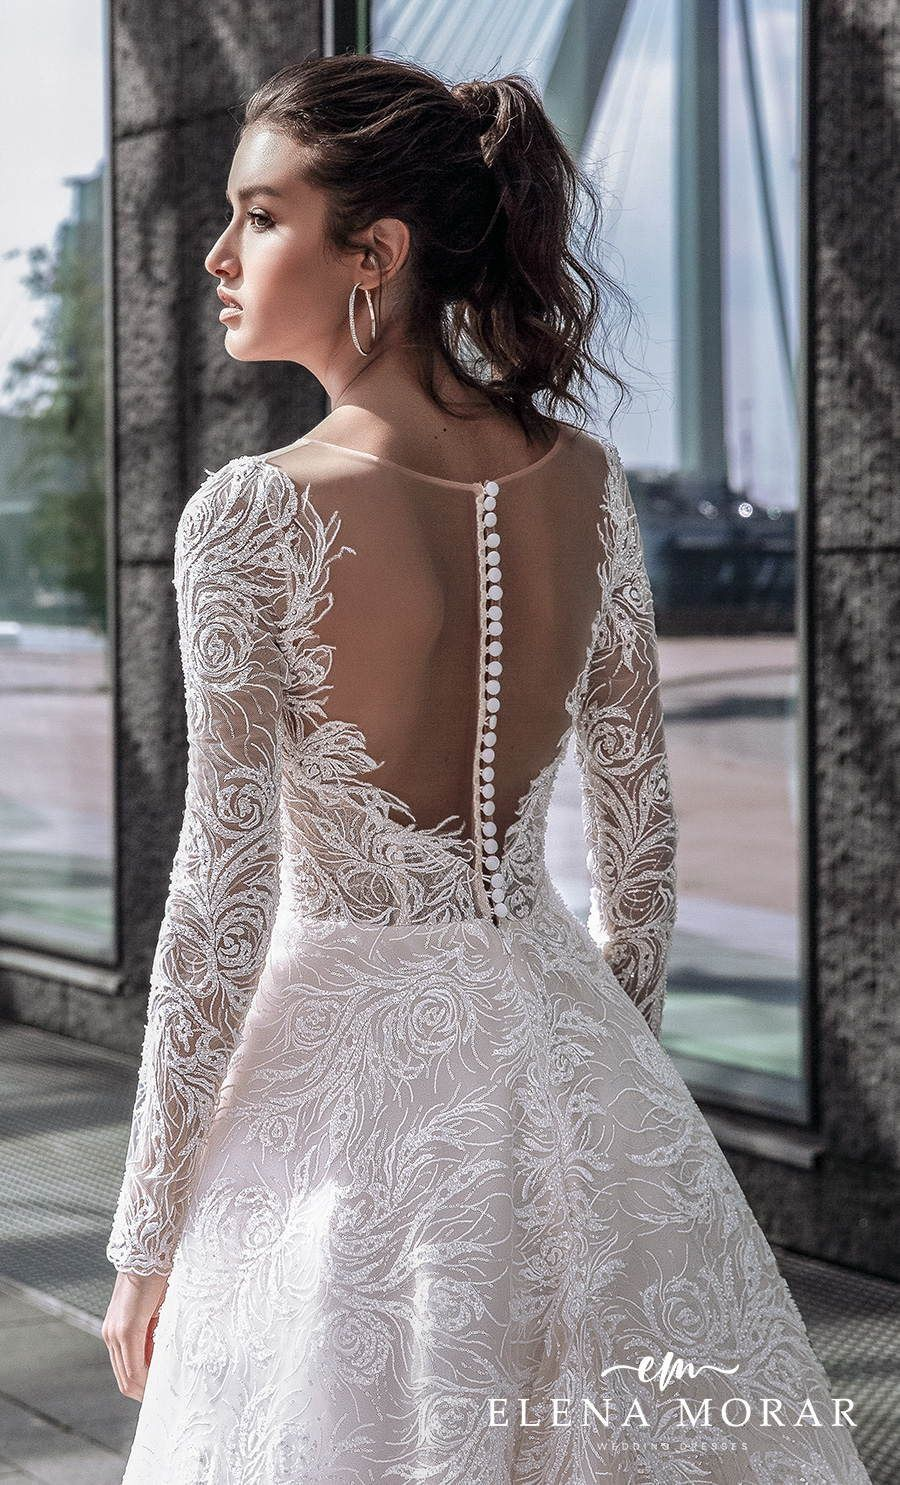 Elena Morar Perfioni Wedding Dresses Wedding Inspirasi Wedding Dresses Wedding Dress Long Sleeve Etsy Wedding Dress [ 1485 x 900 Pixel ]